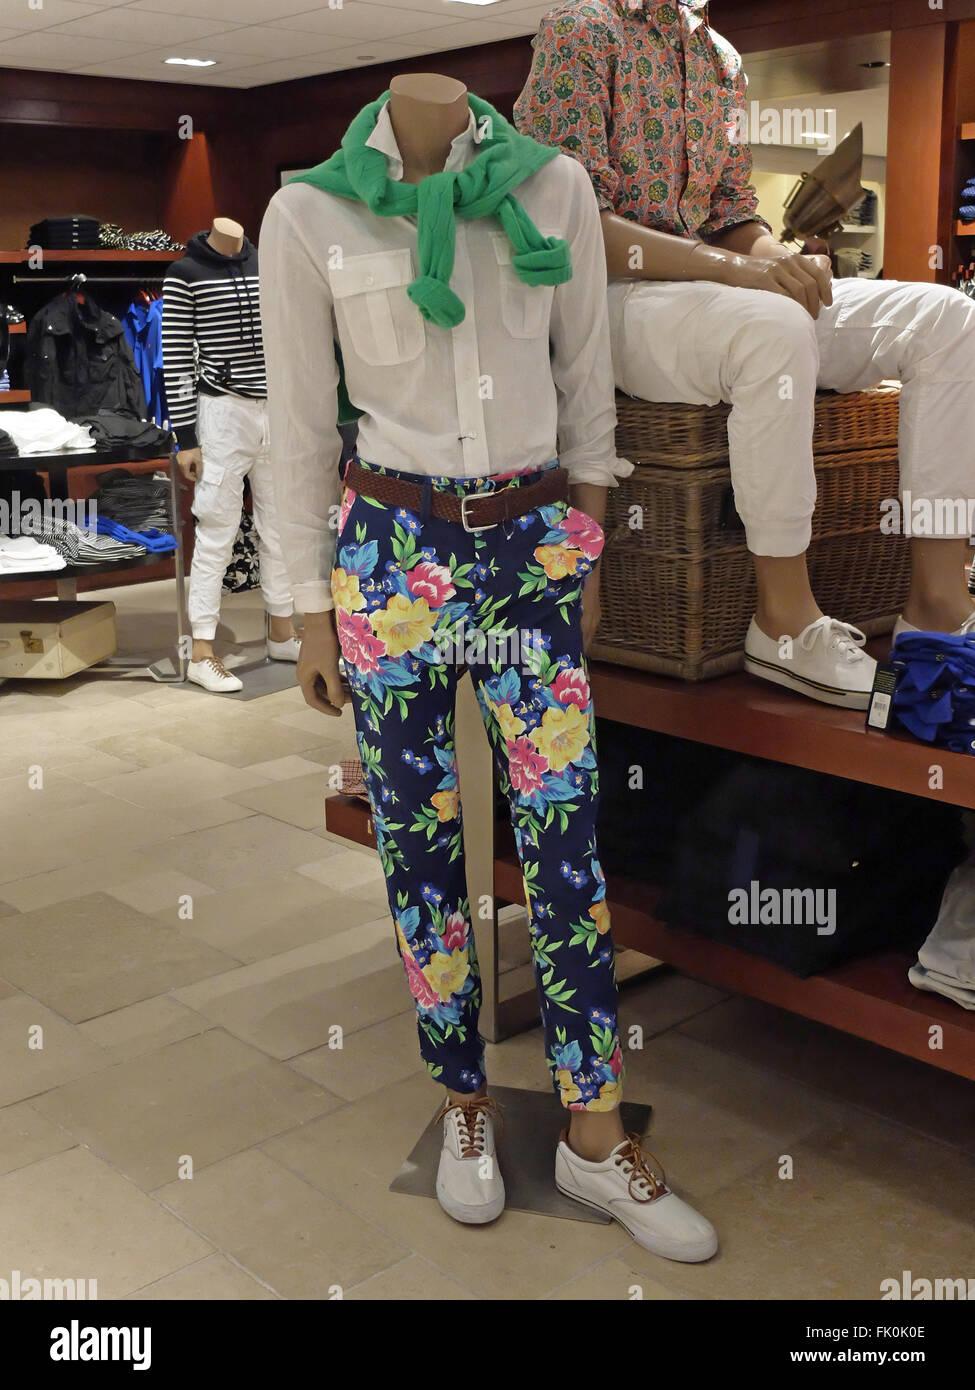 93d0110e7d A loud pair of floral men s trousers for sale at the Ralph Lauren shop in  Bloomingdale s